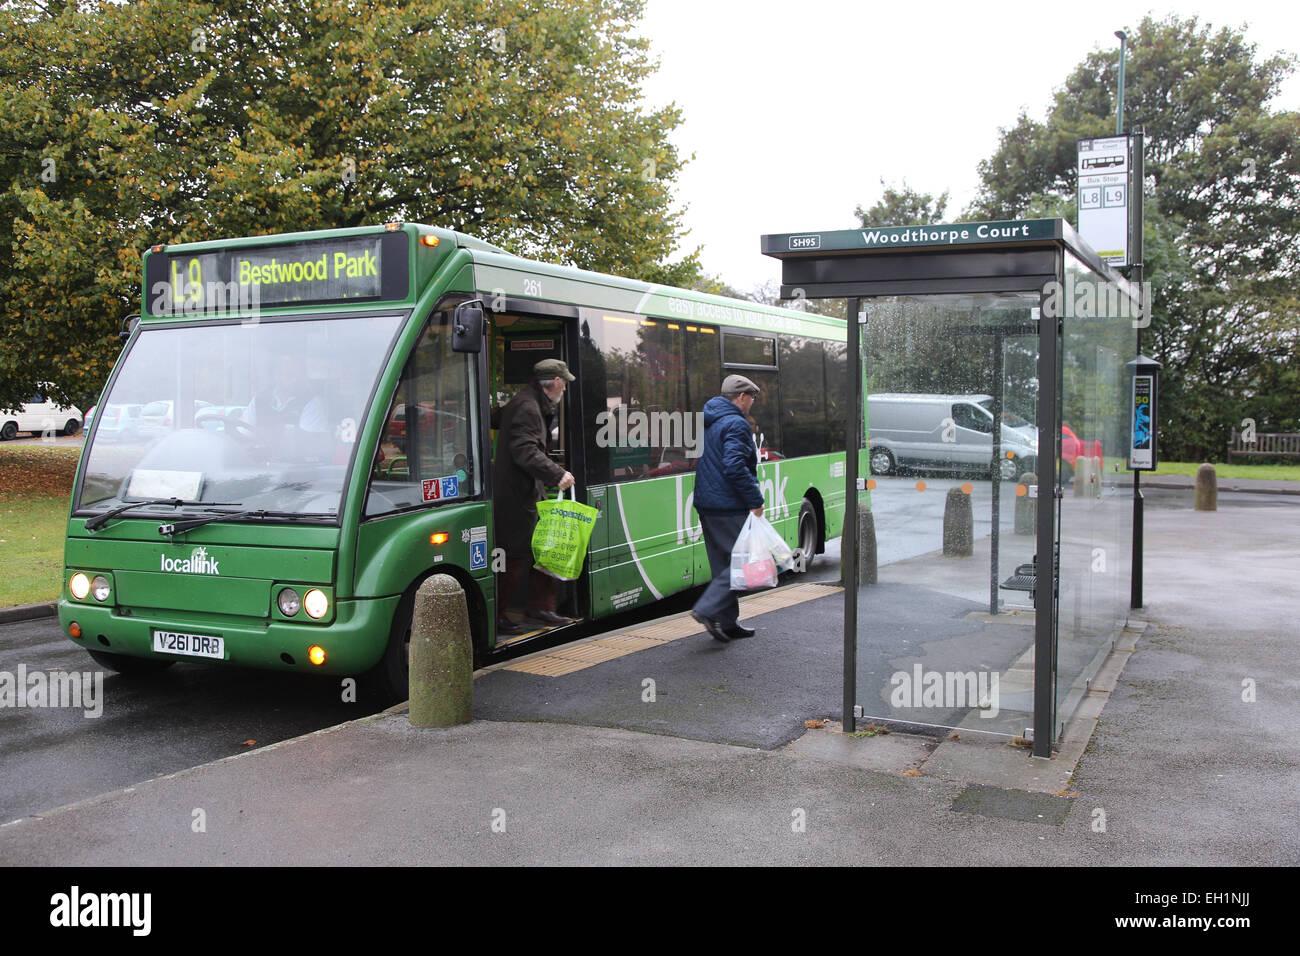 Local bus service, Nottingham, - Stock Image